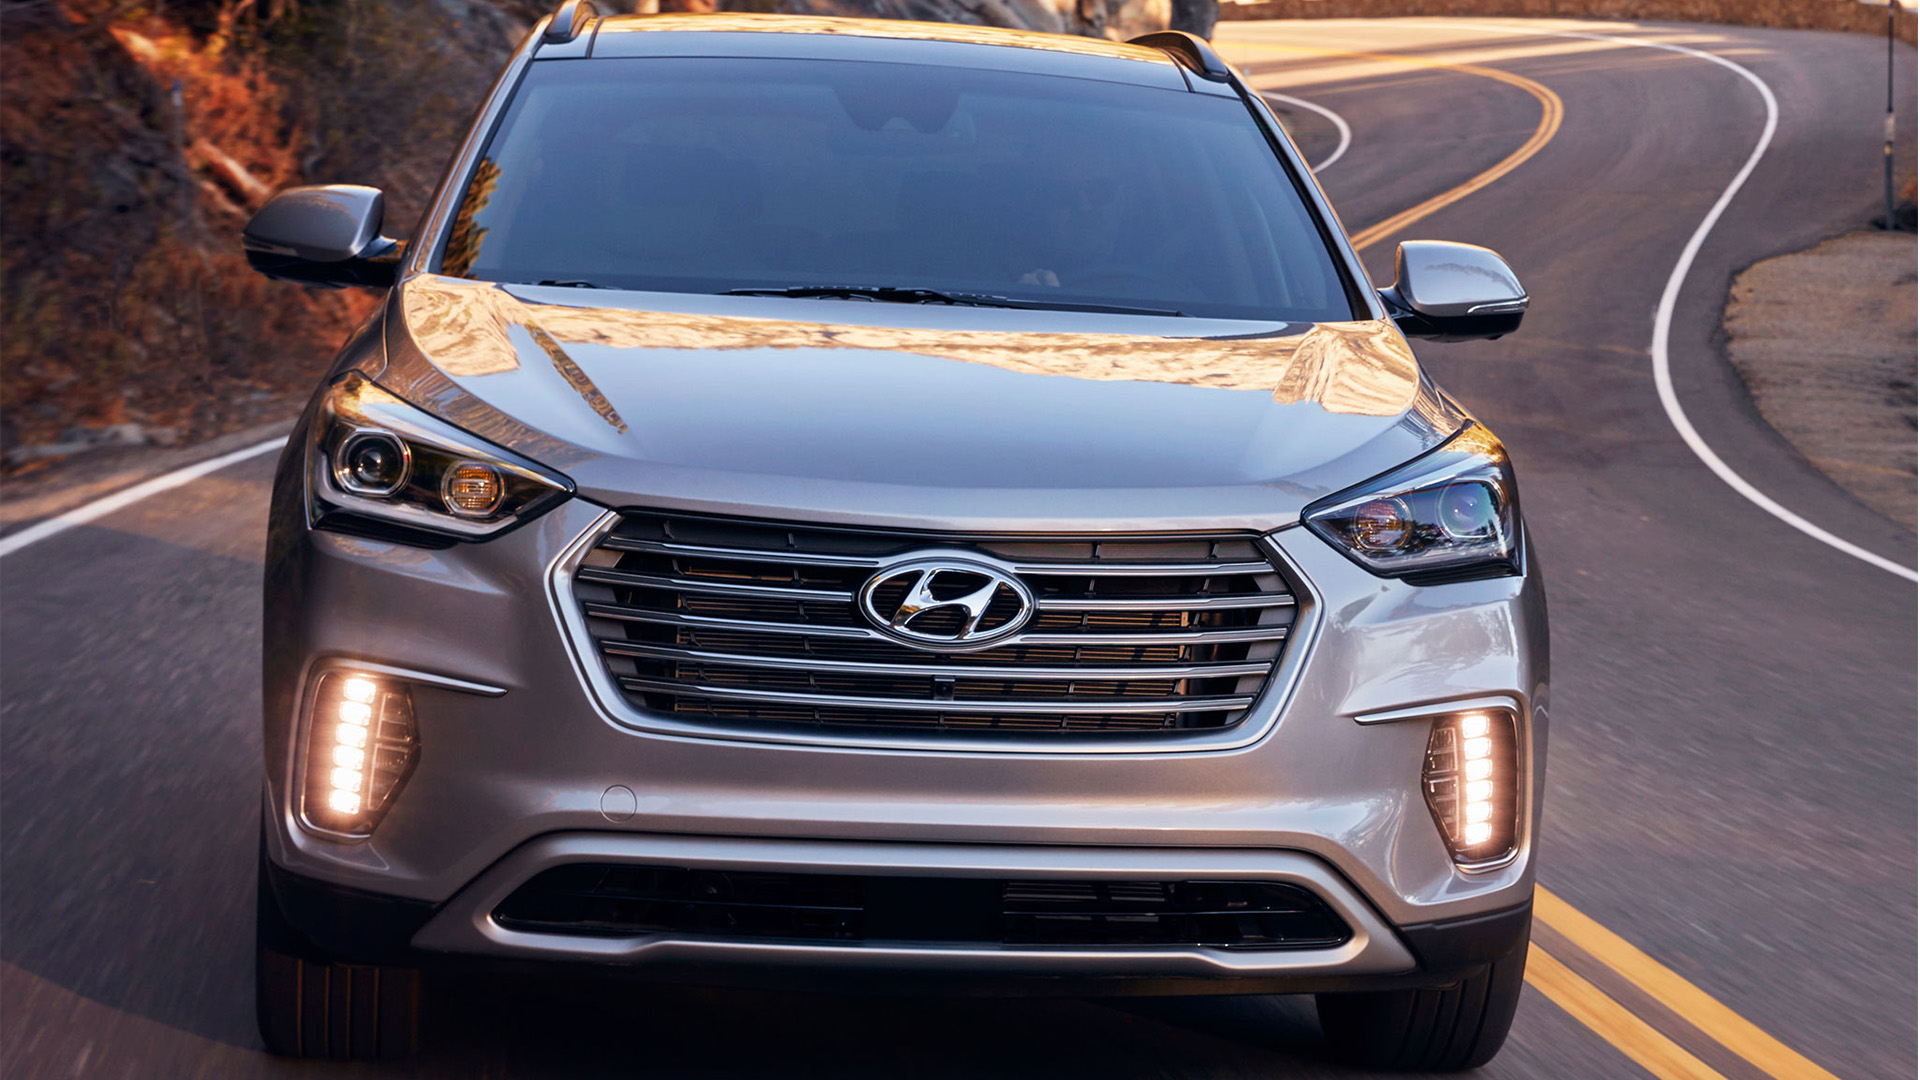 Hyundai Fort Lauderdale International Auto Show